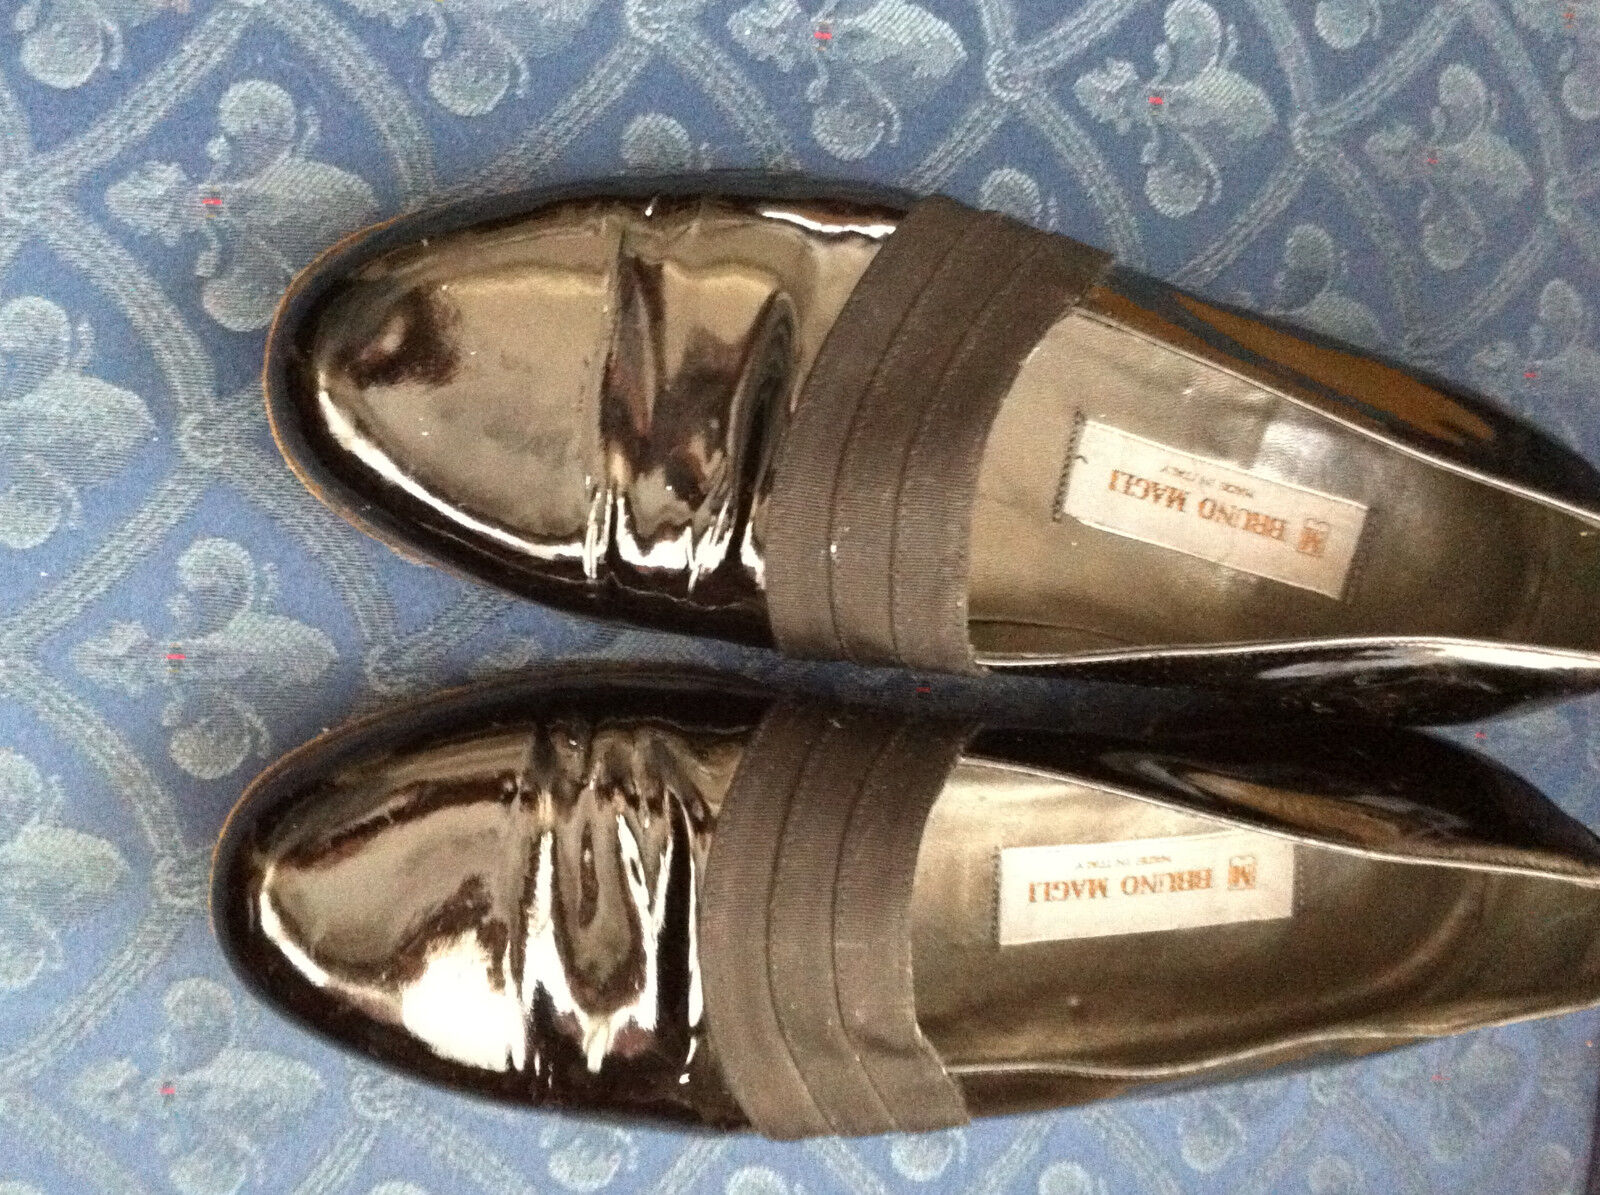 Bruno magli tuxedo made in italy men's shoes